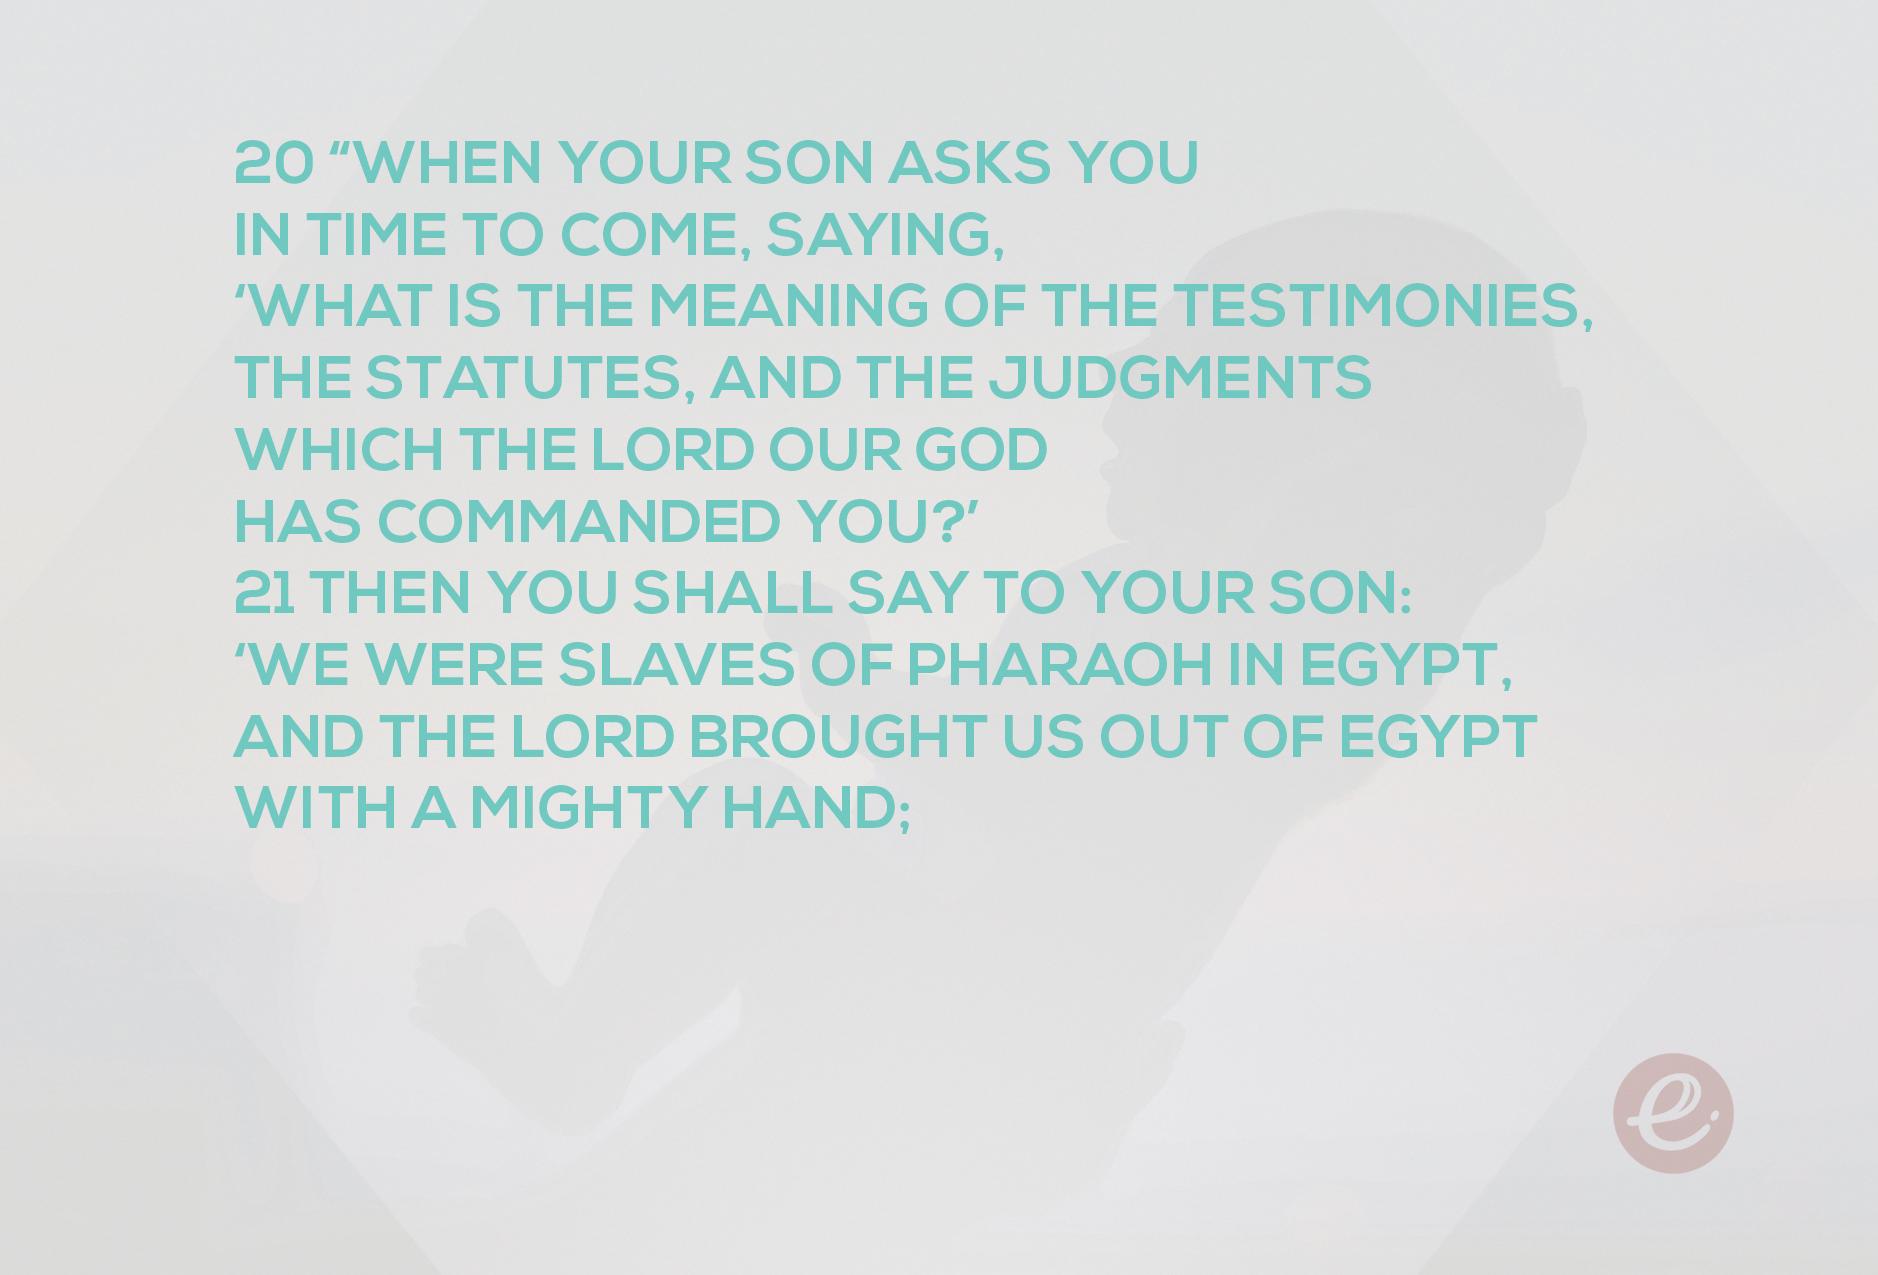 sermon_text_20-21.jpg